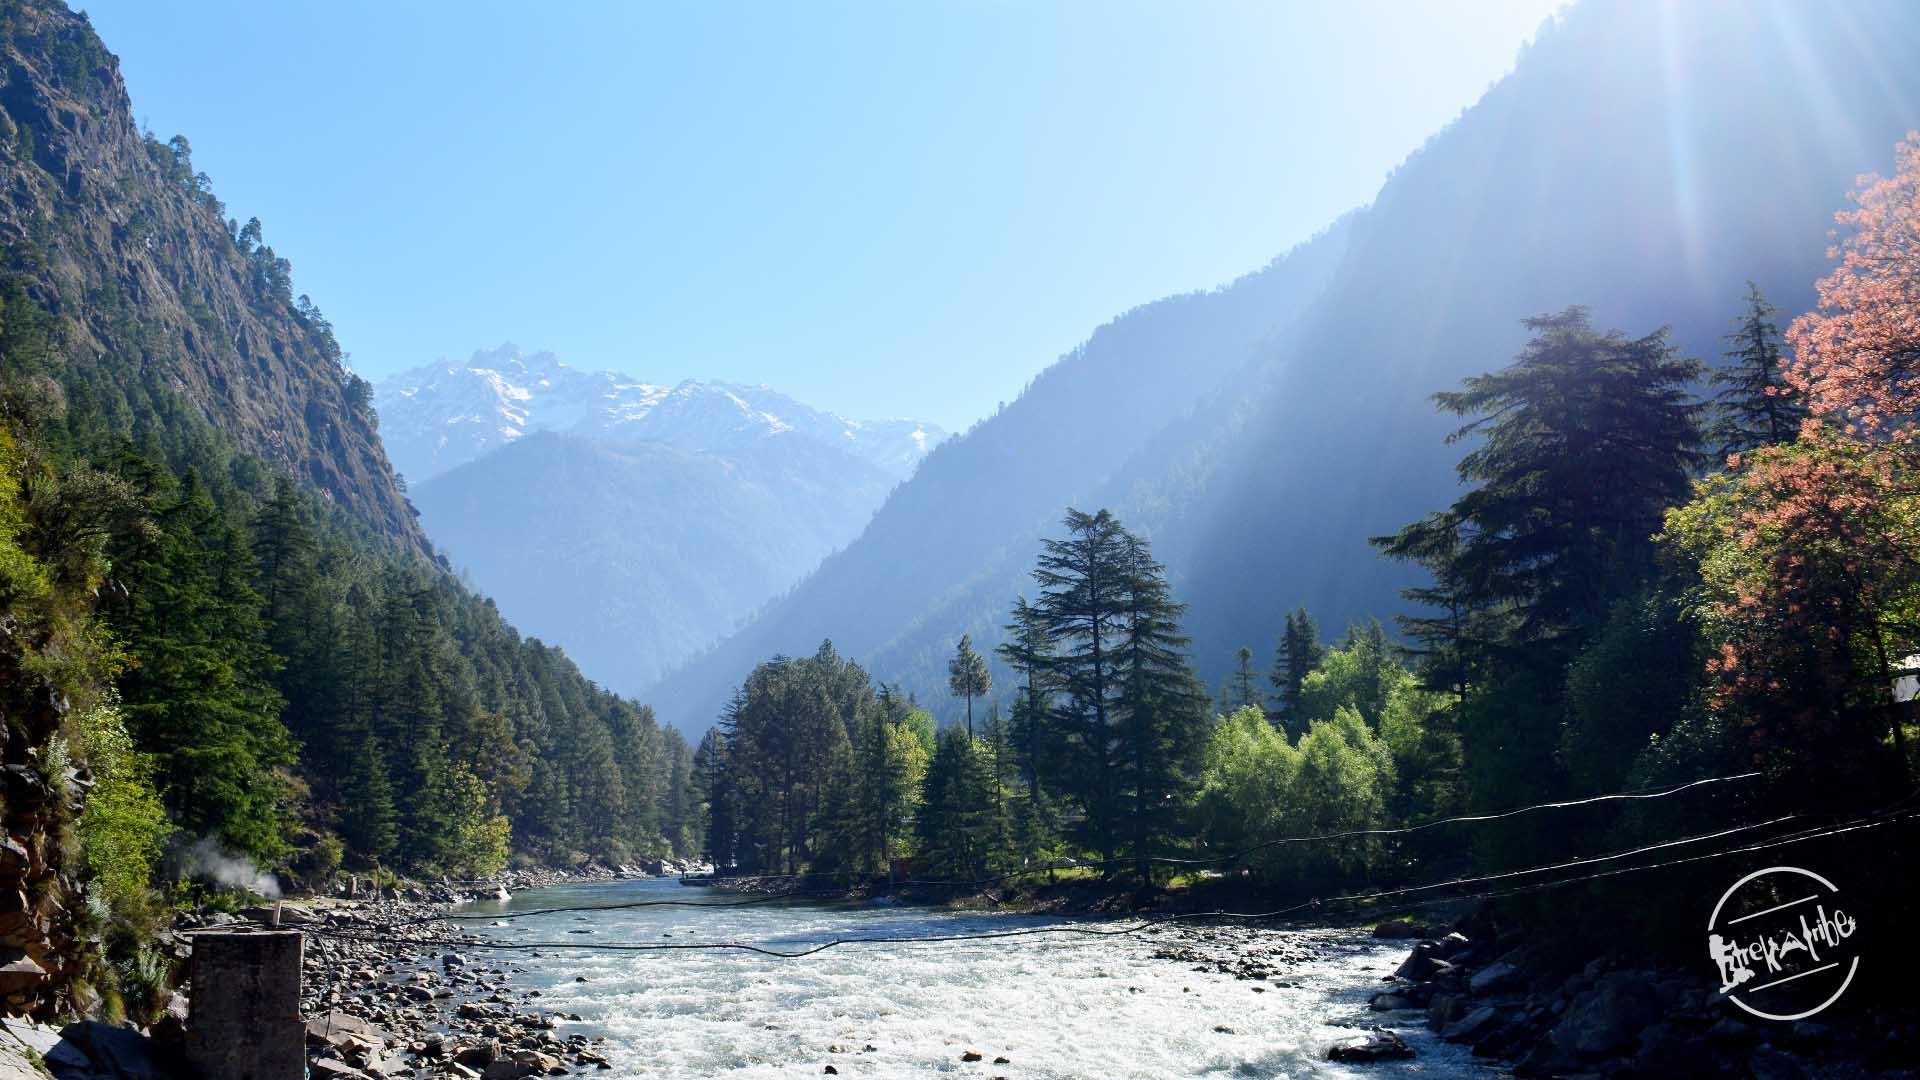 en-route Rasol Trek - Parvati river view from kasol - challal bridge